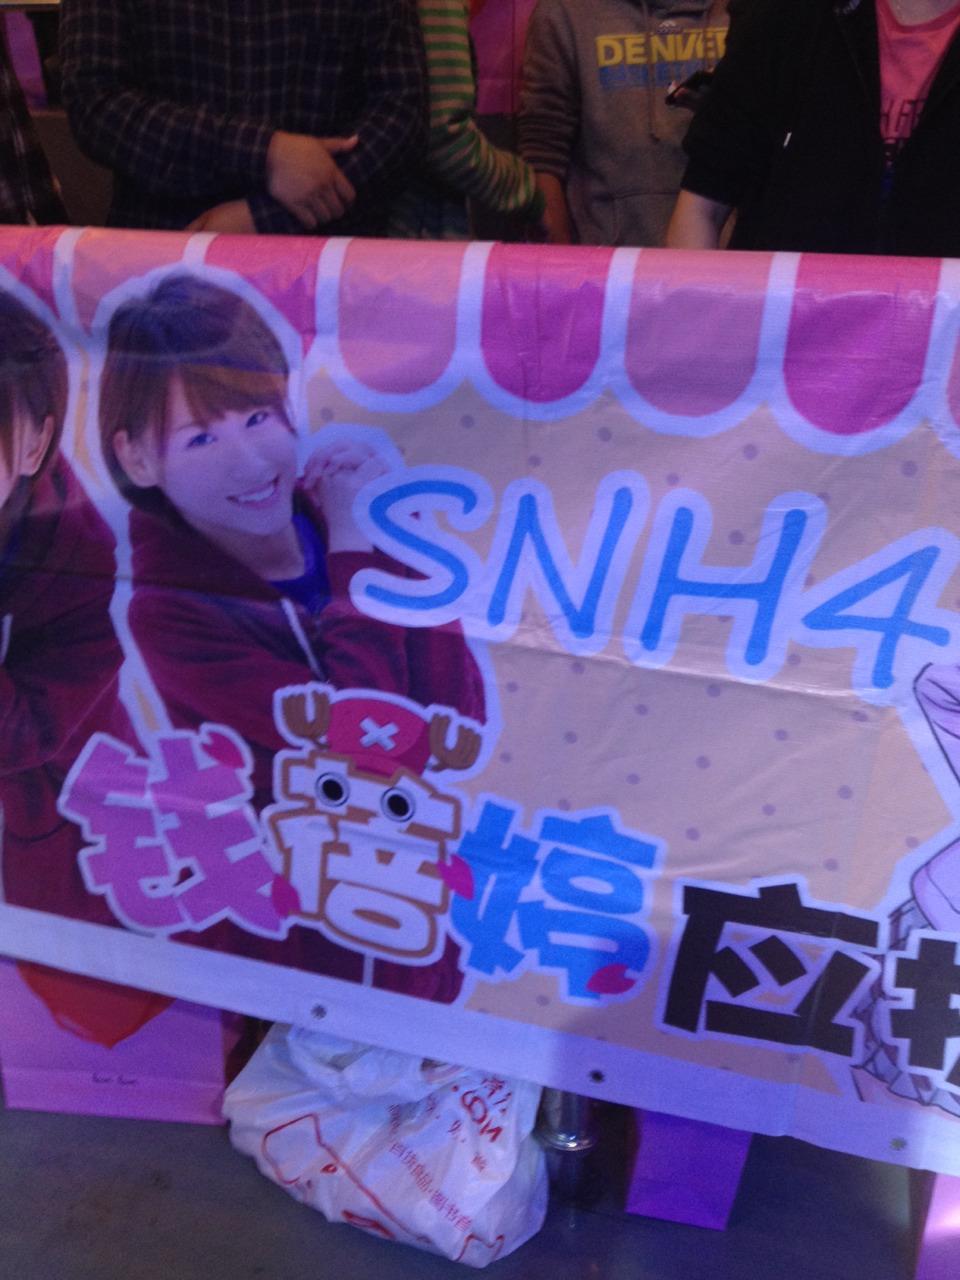 【SNH48】マネー(錢蓓婷)の生誕祭関連写真の追加分です(生誕グッズなど)